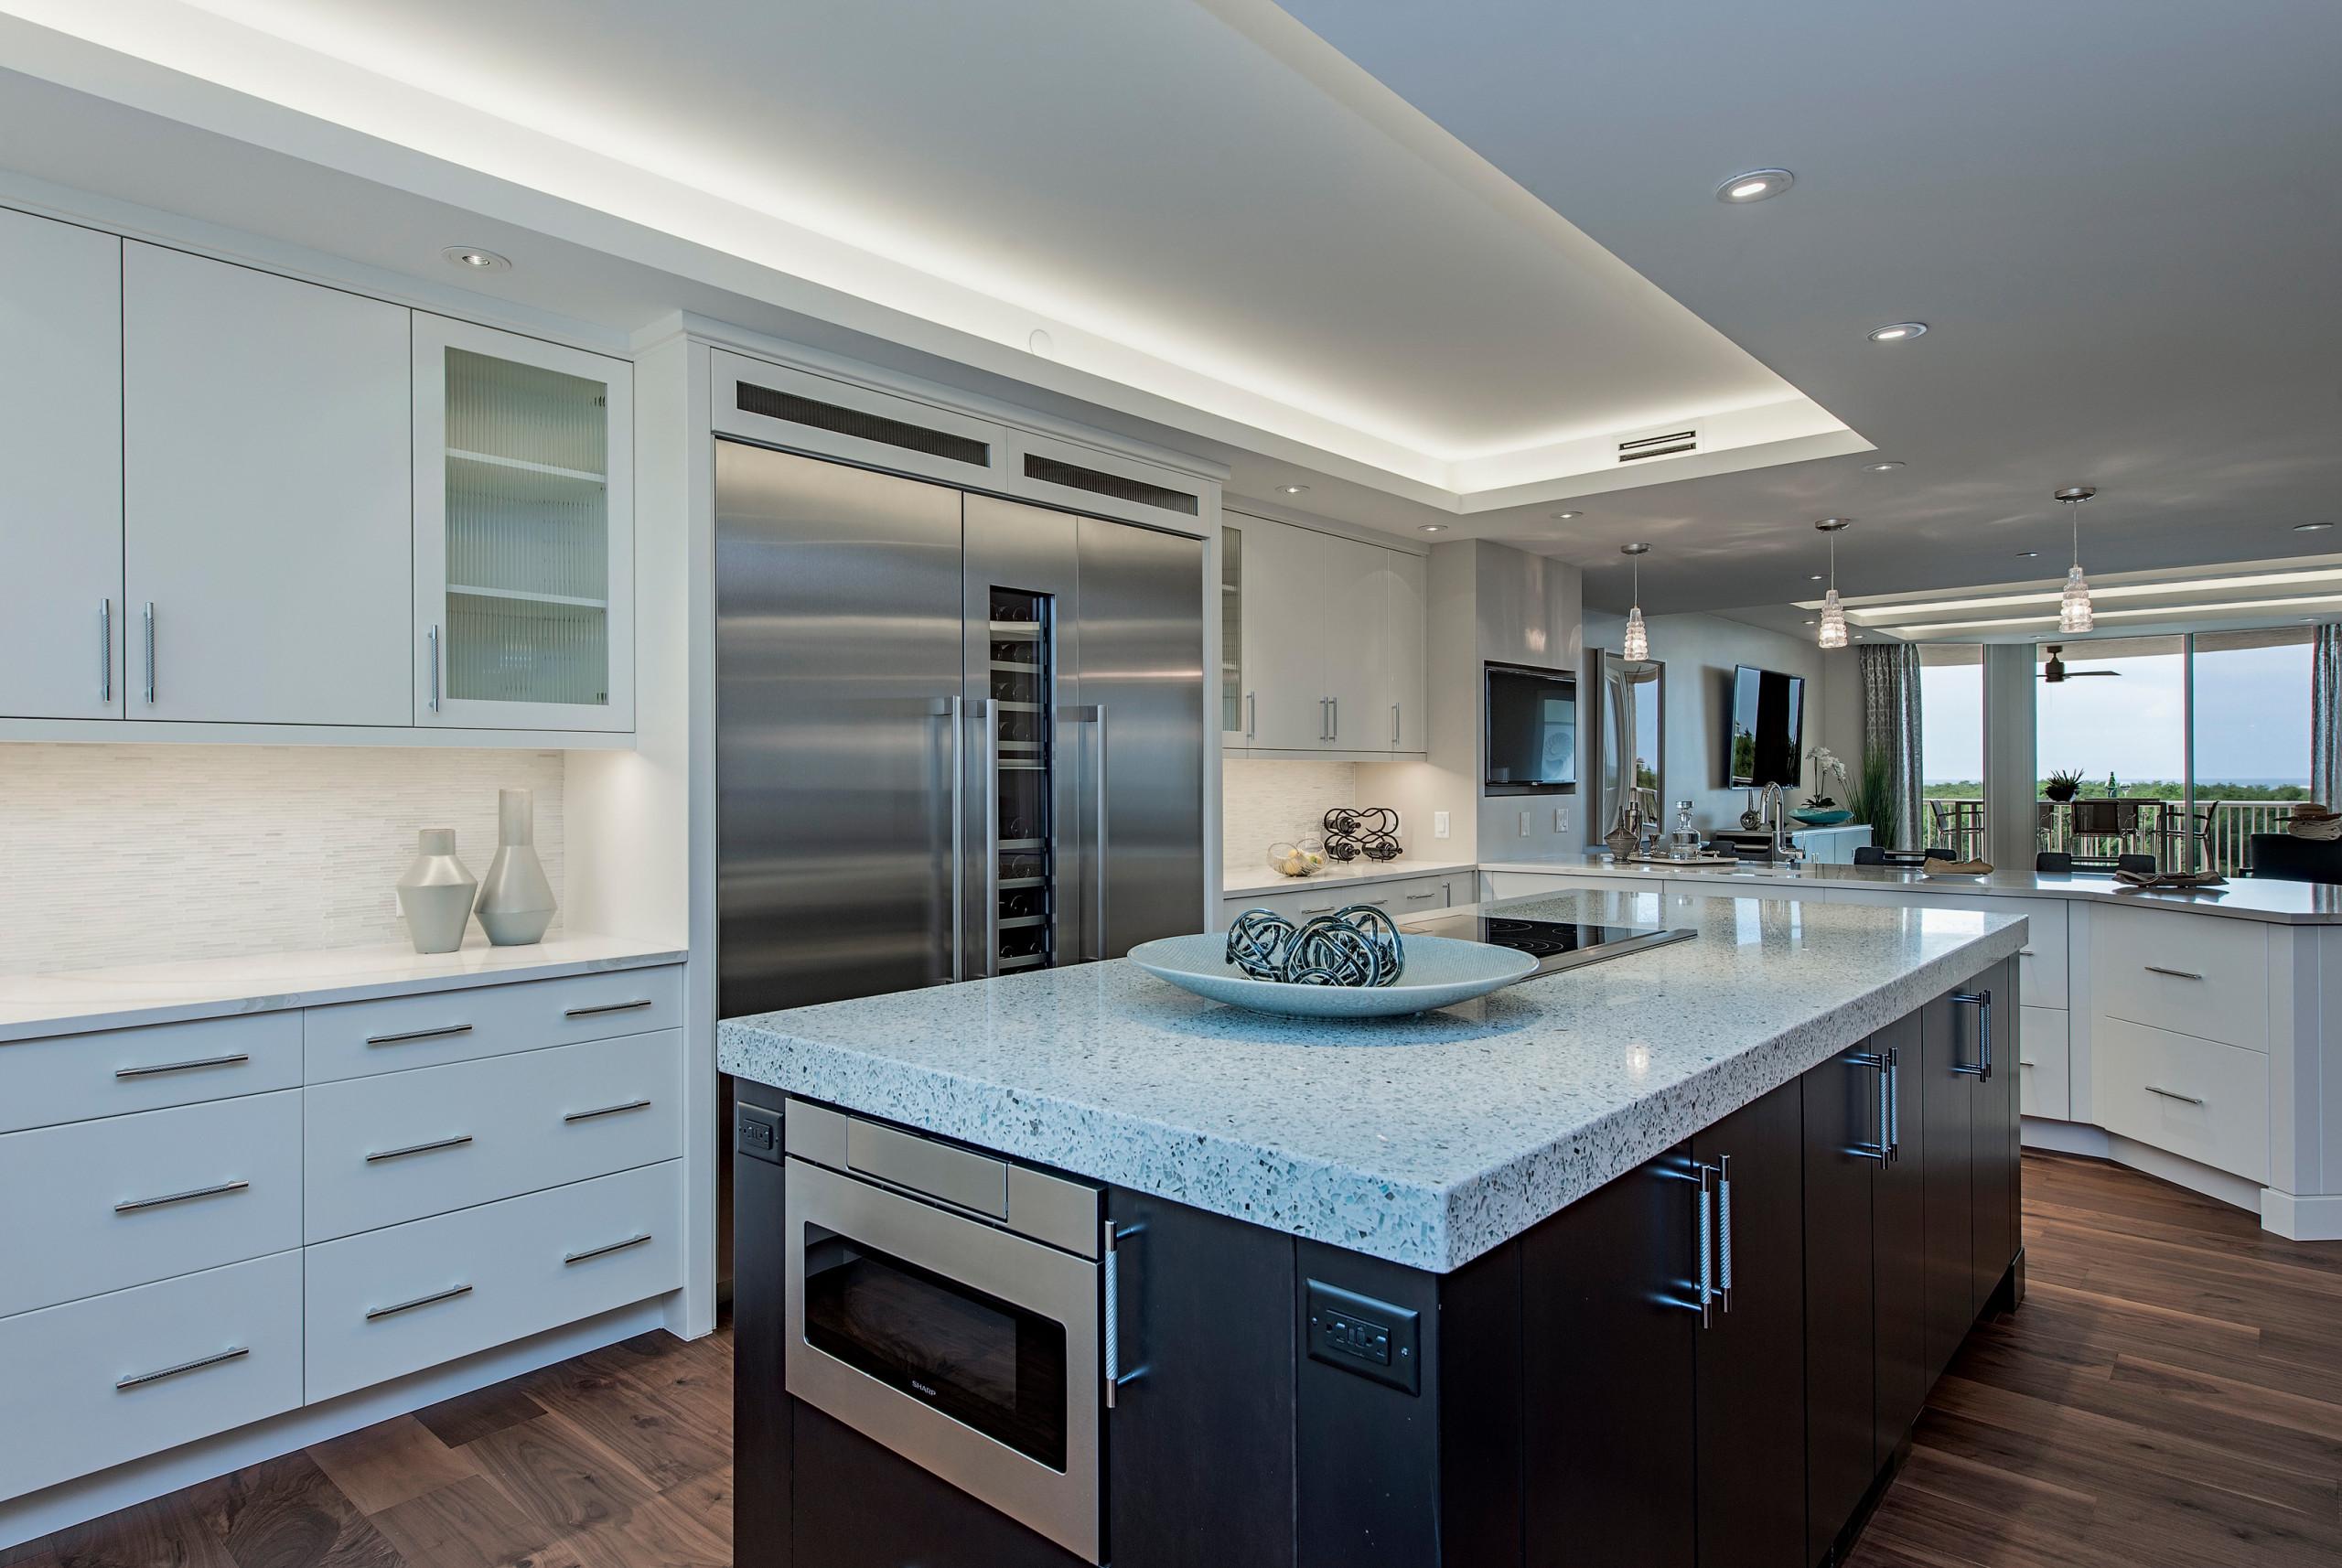 Certified Luxury Builders - 41 West - Pelican Bay - Contemporary Kitchen